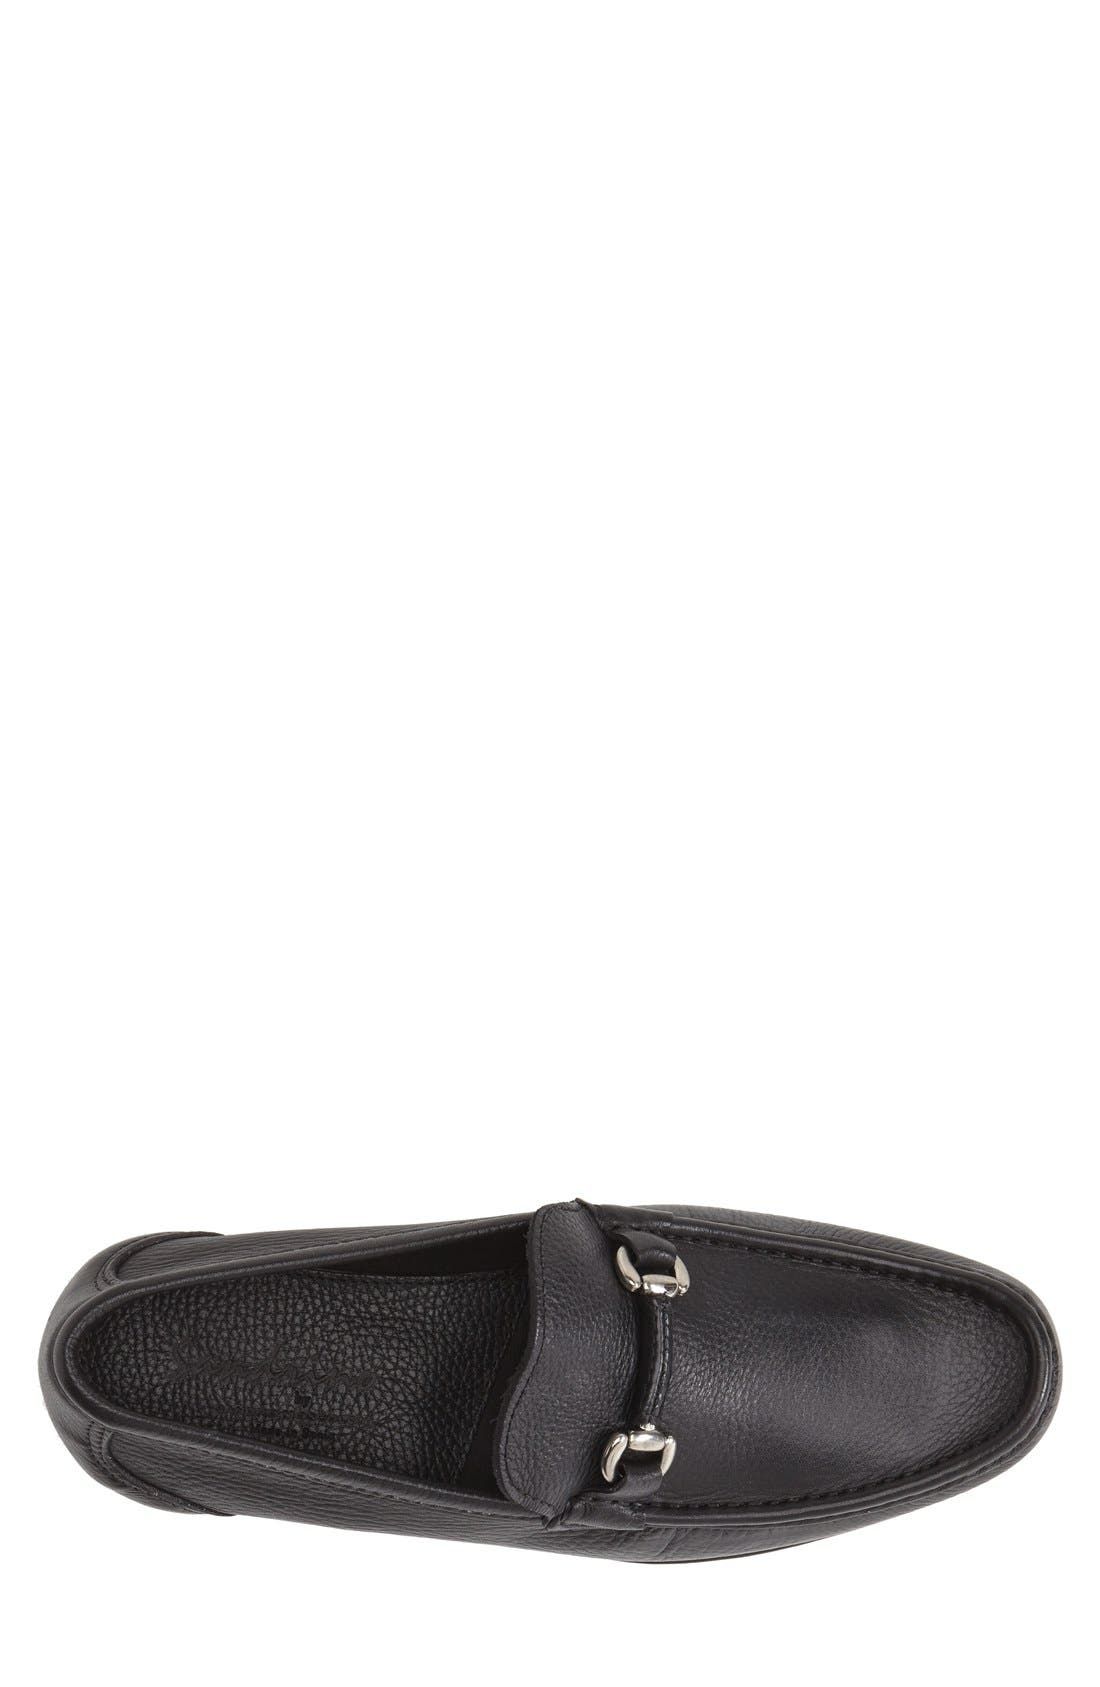 Alternate Image 3  - Sandro Moscoloni 'San Remo' Leather Bit Loafer (Men)